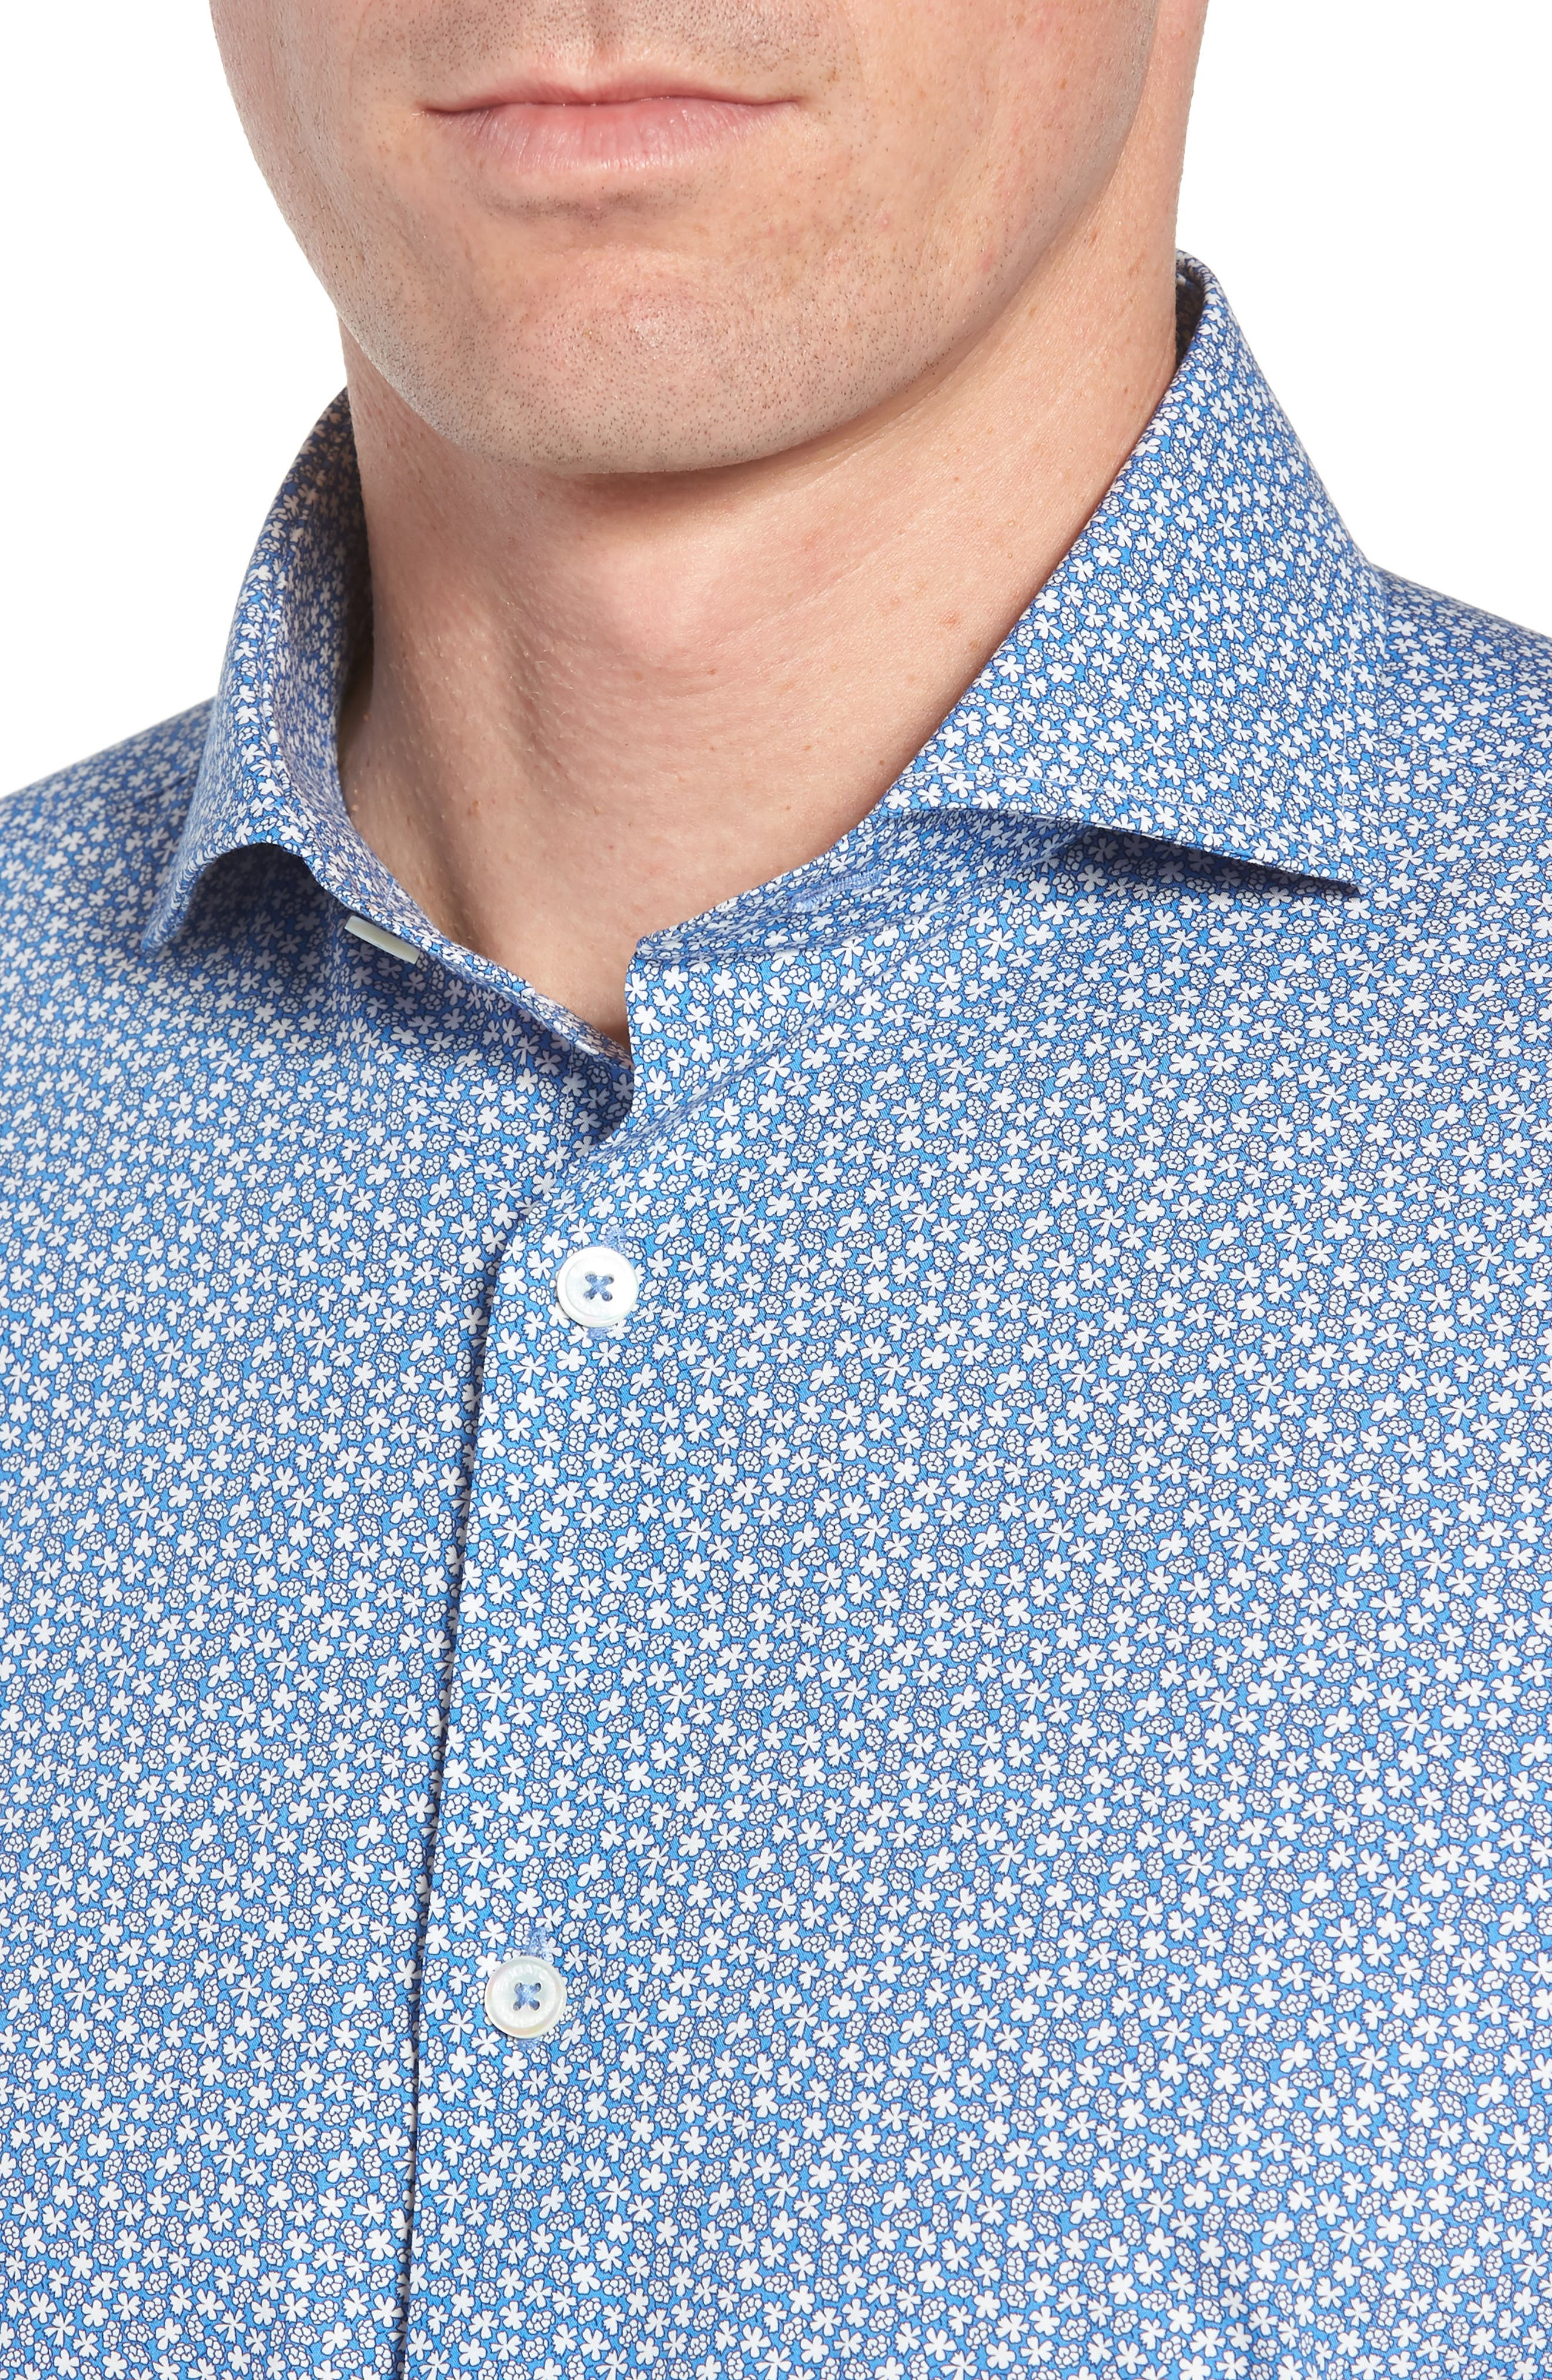 Trim Fit Print Dress Shirt,                             Alternate thumbnail 2, color,                             CLASSIC BLUE